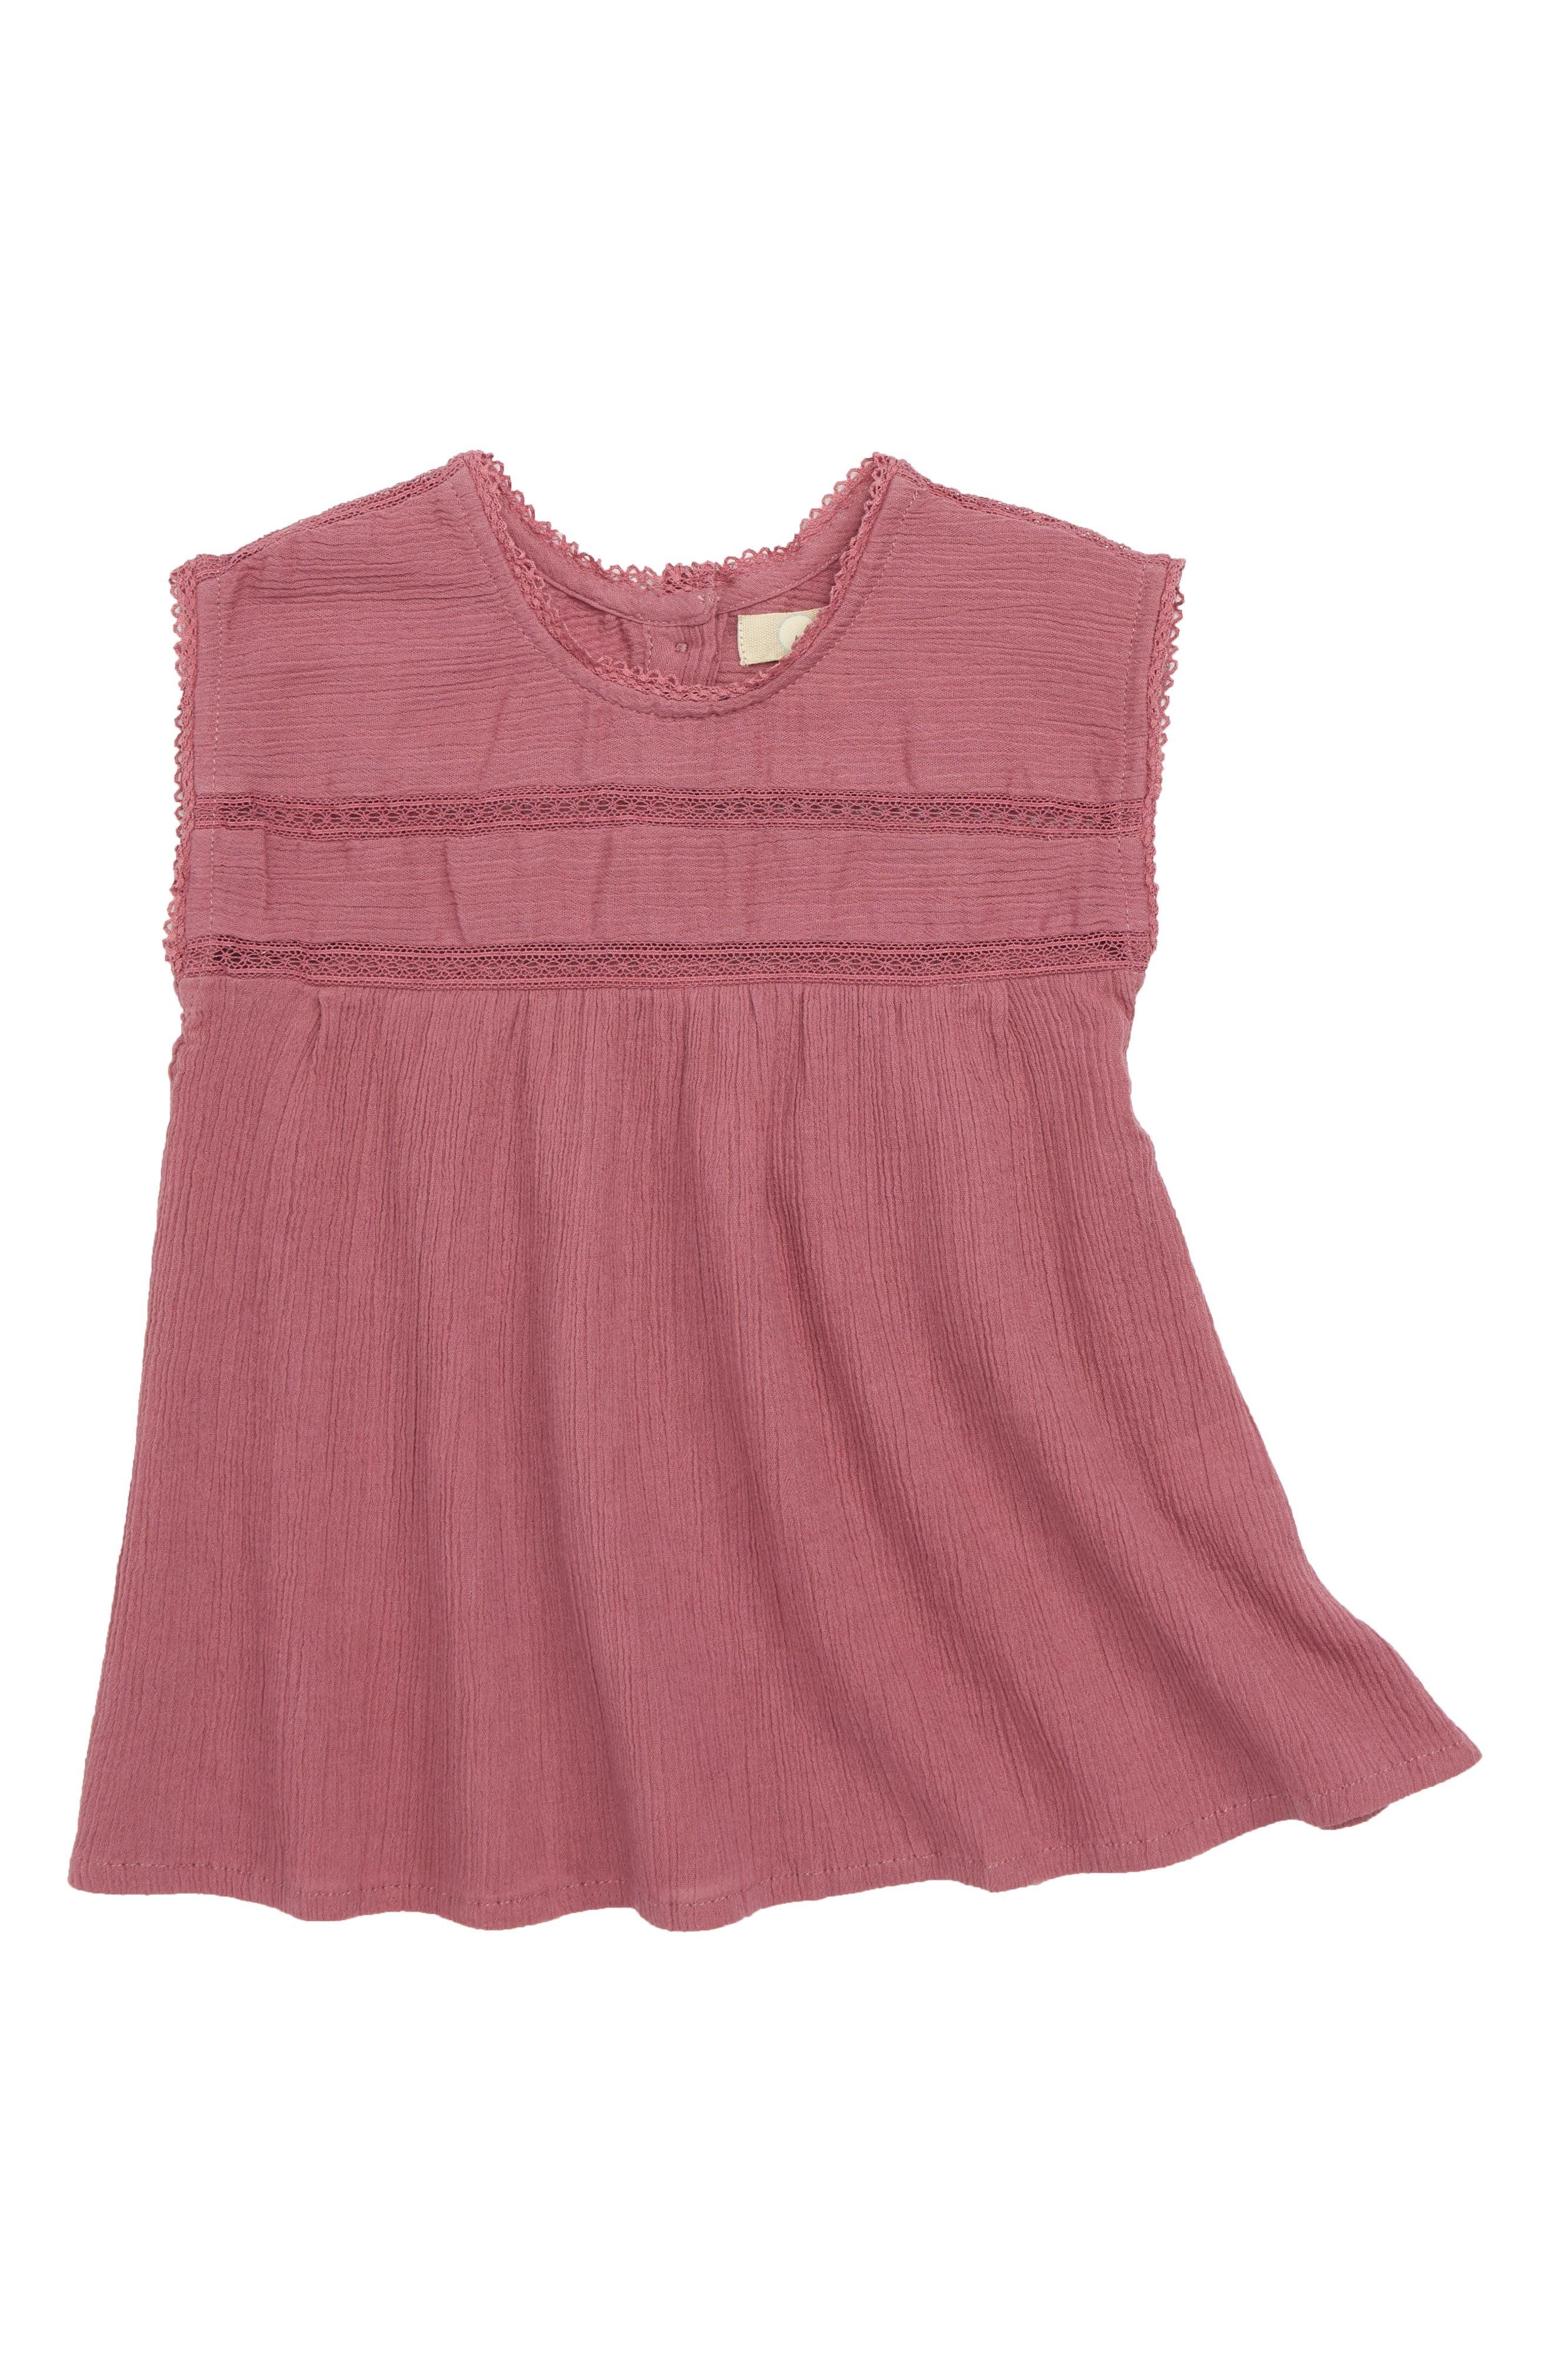 Kensie Crinkle Dress,                             Main thumbnail 1, color,                             Mauve